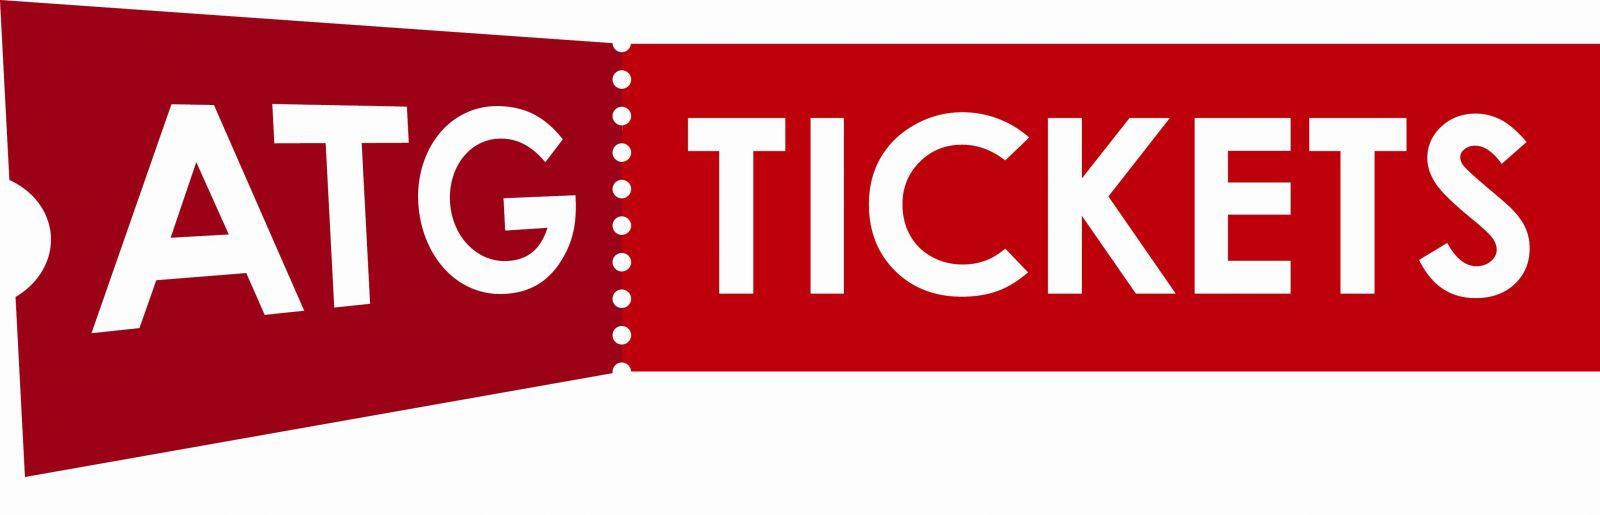 a5c84d007a17e ATG Tickets Discount Code